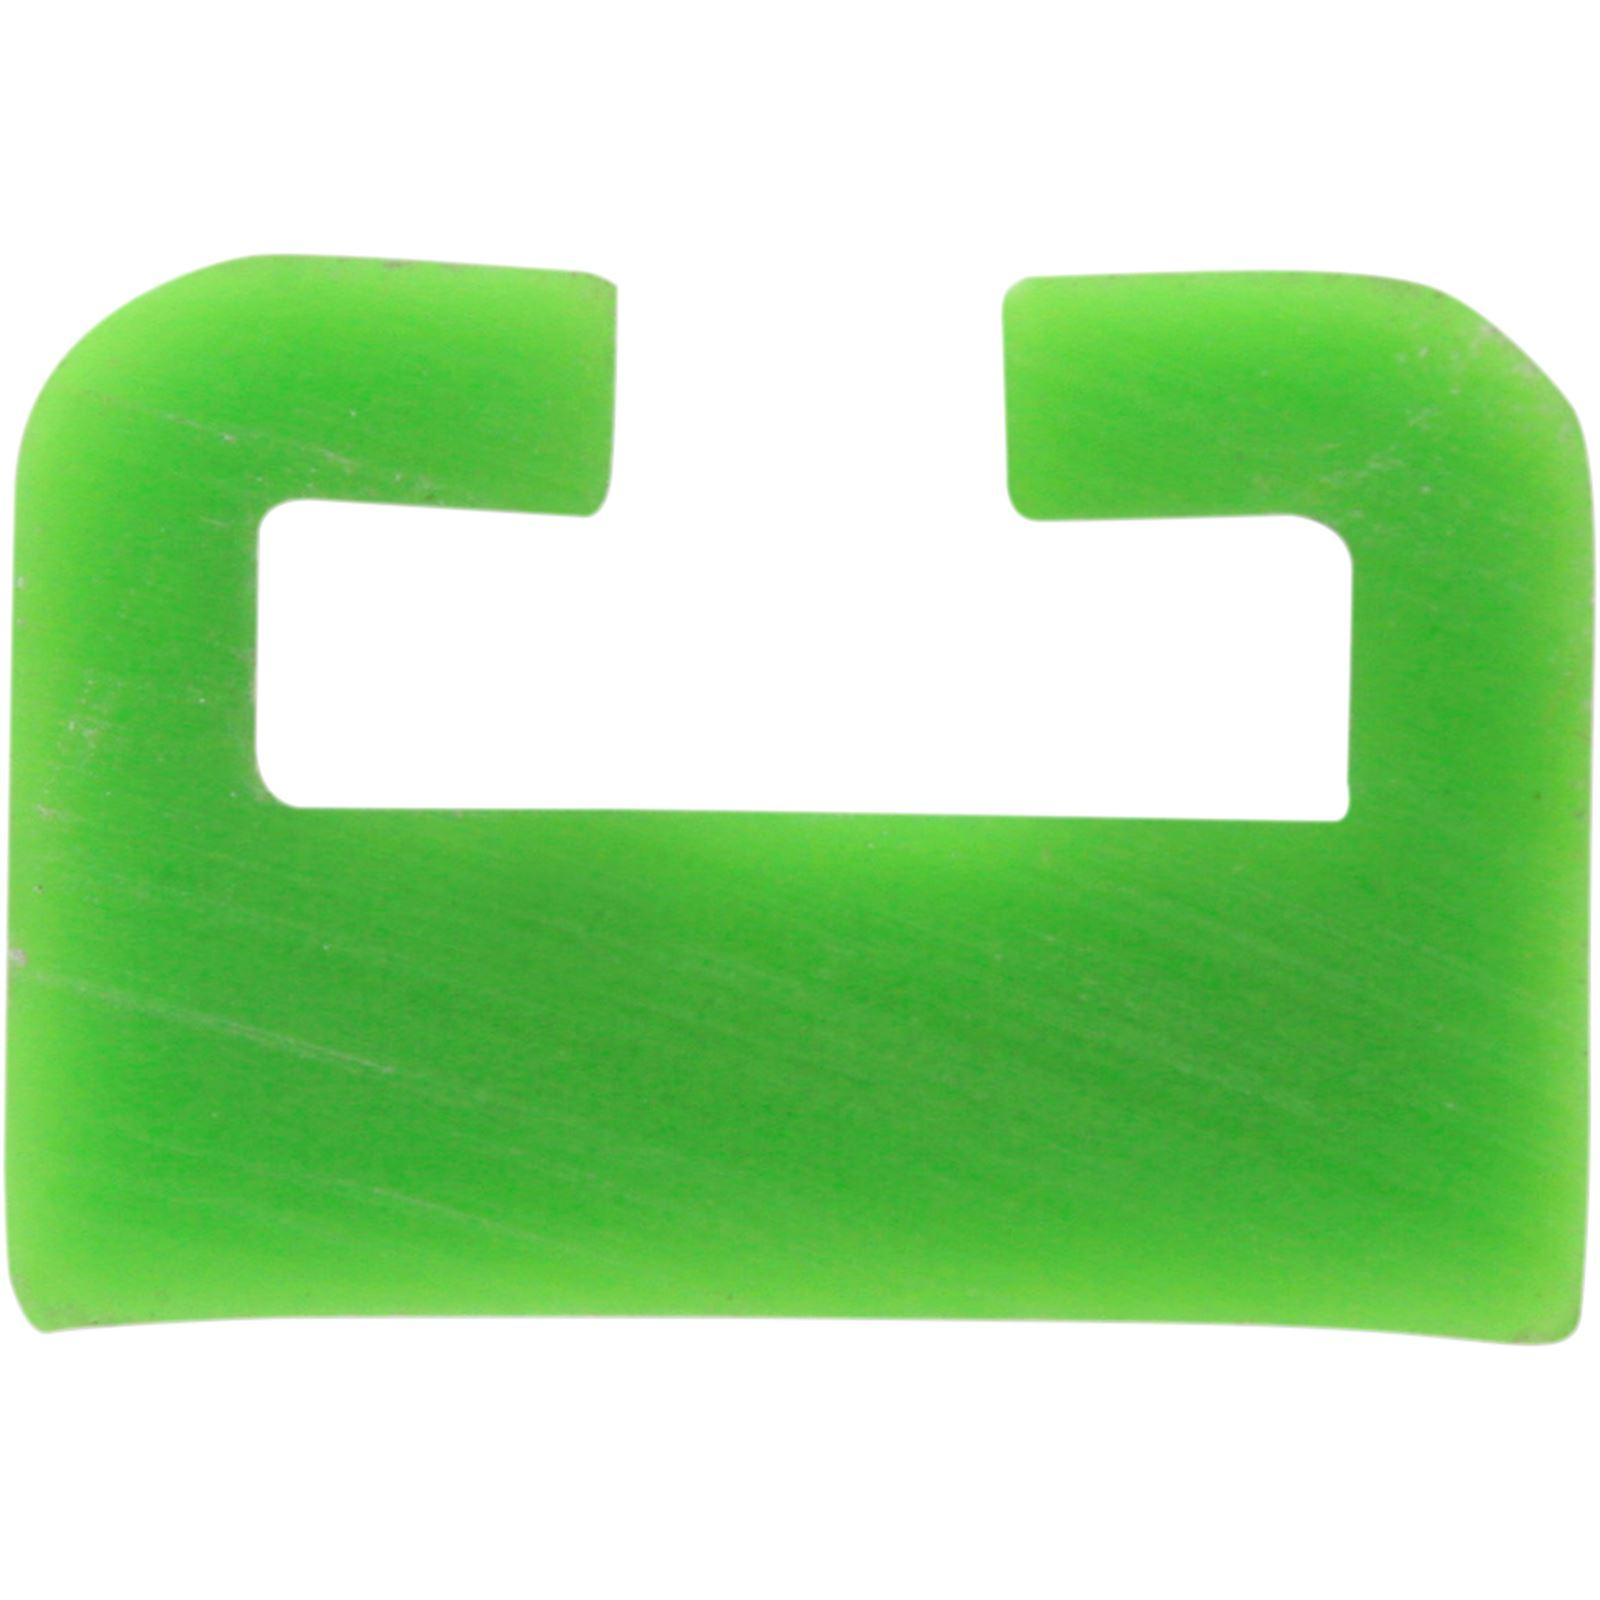 "Garland Green Replacement Slide - UHMW - Profile 10 - Length 64.00"" - Arctic Cat"